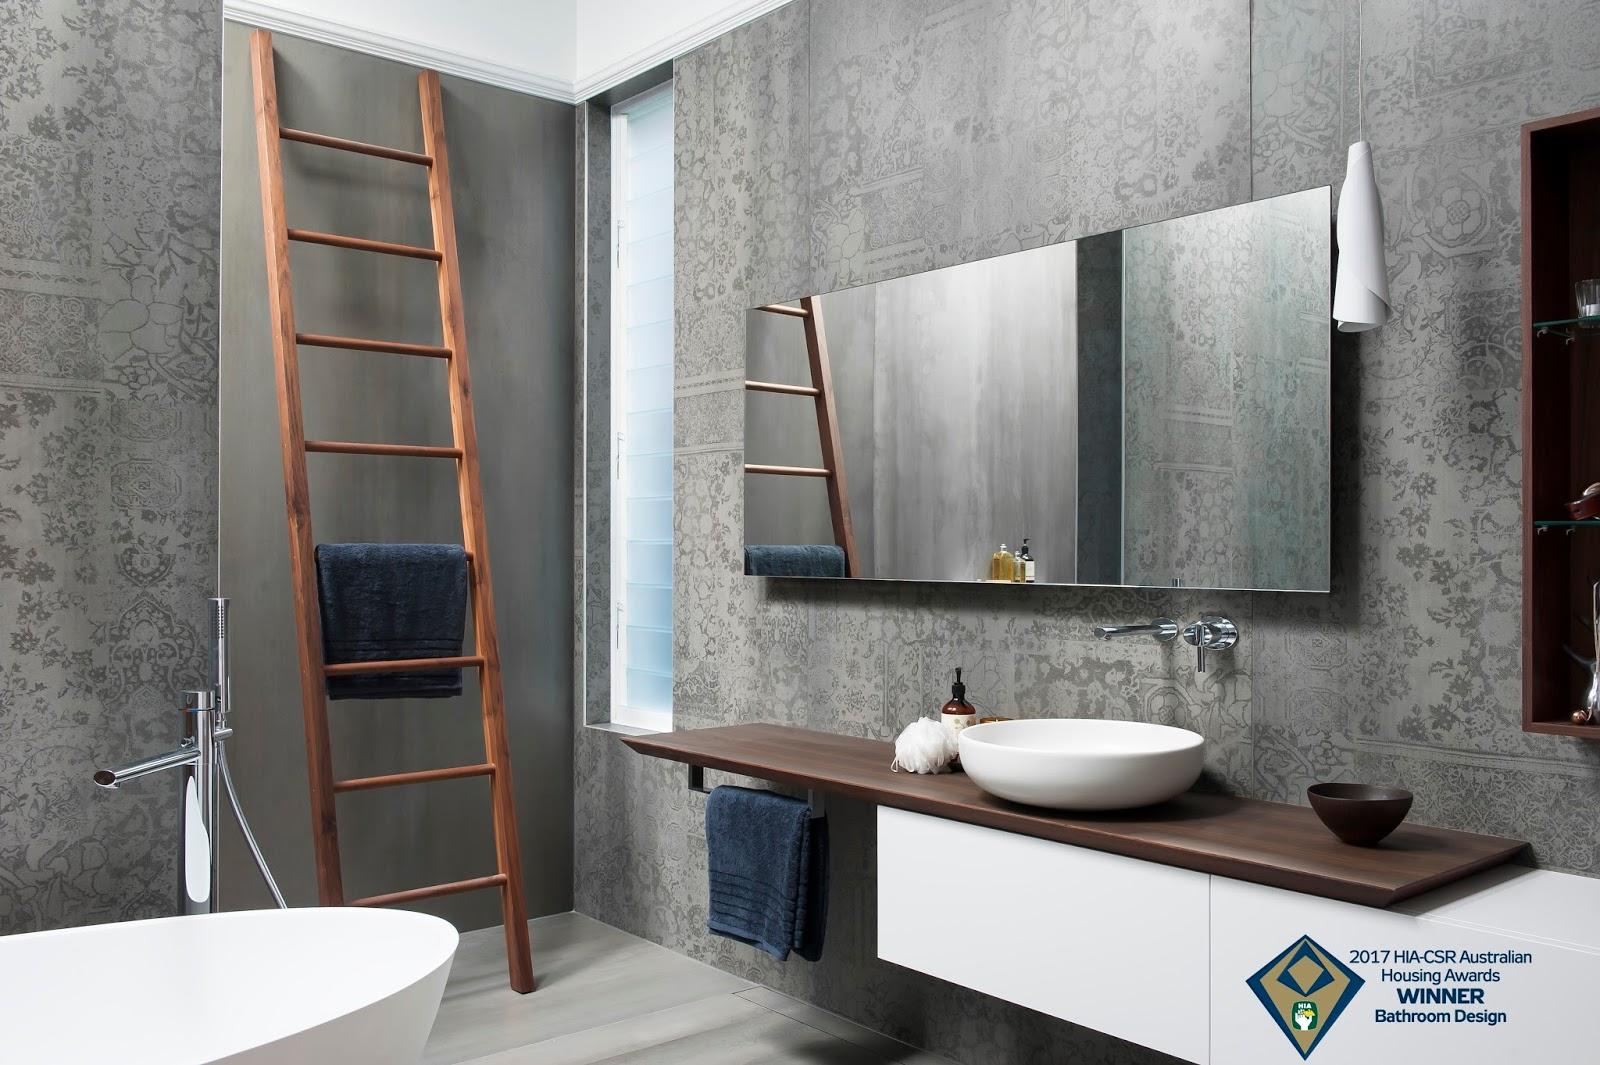 Best Kitchen Gallery: Minosa Australian Hia Bathroom Design Of The Year 2017 of Award Winning Bathroom Designs  on rachelxblog.com